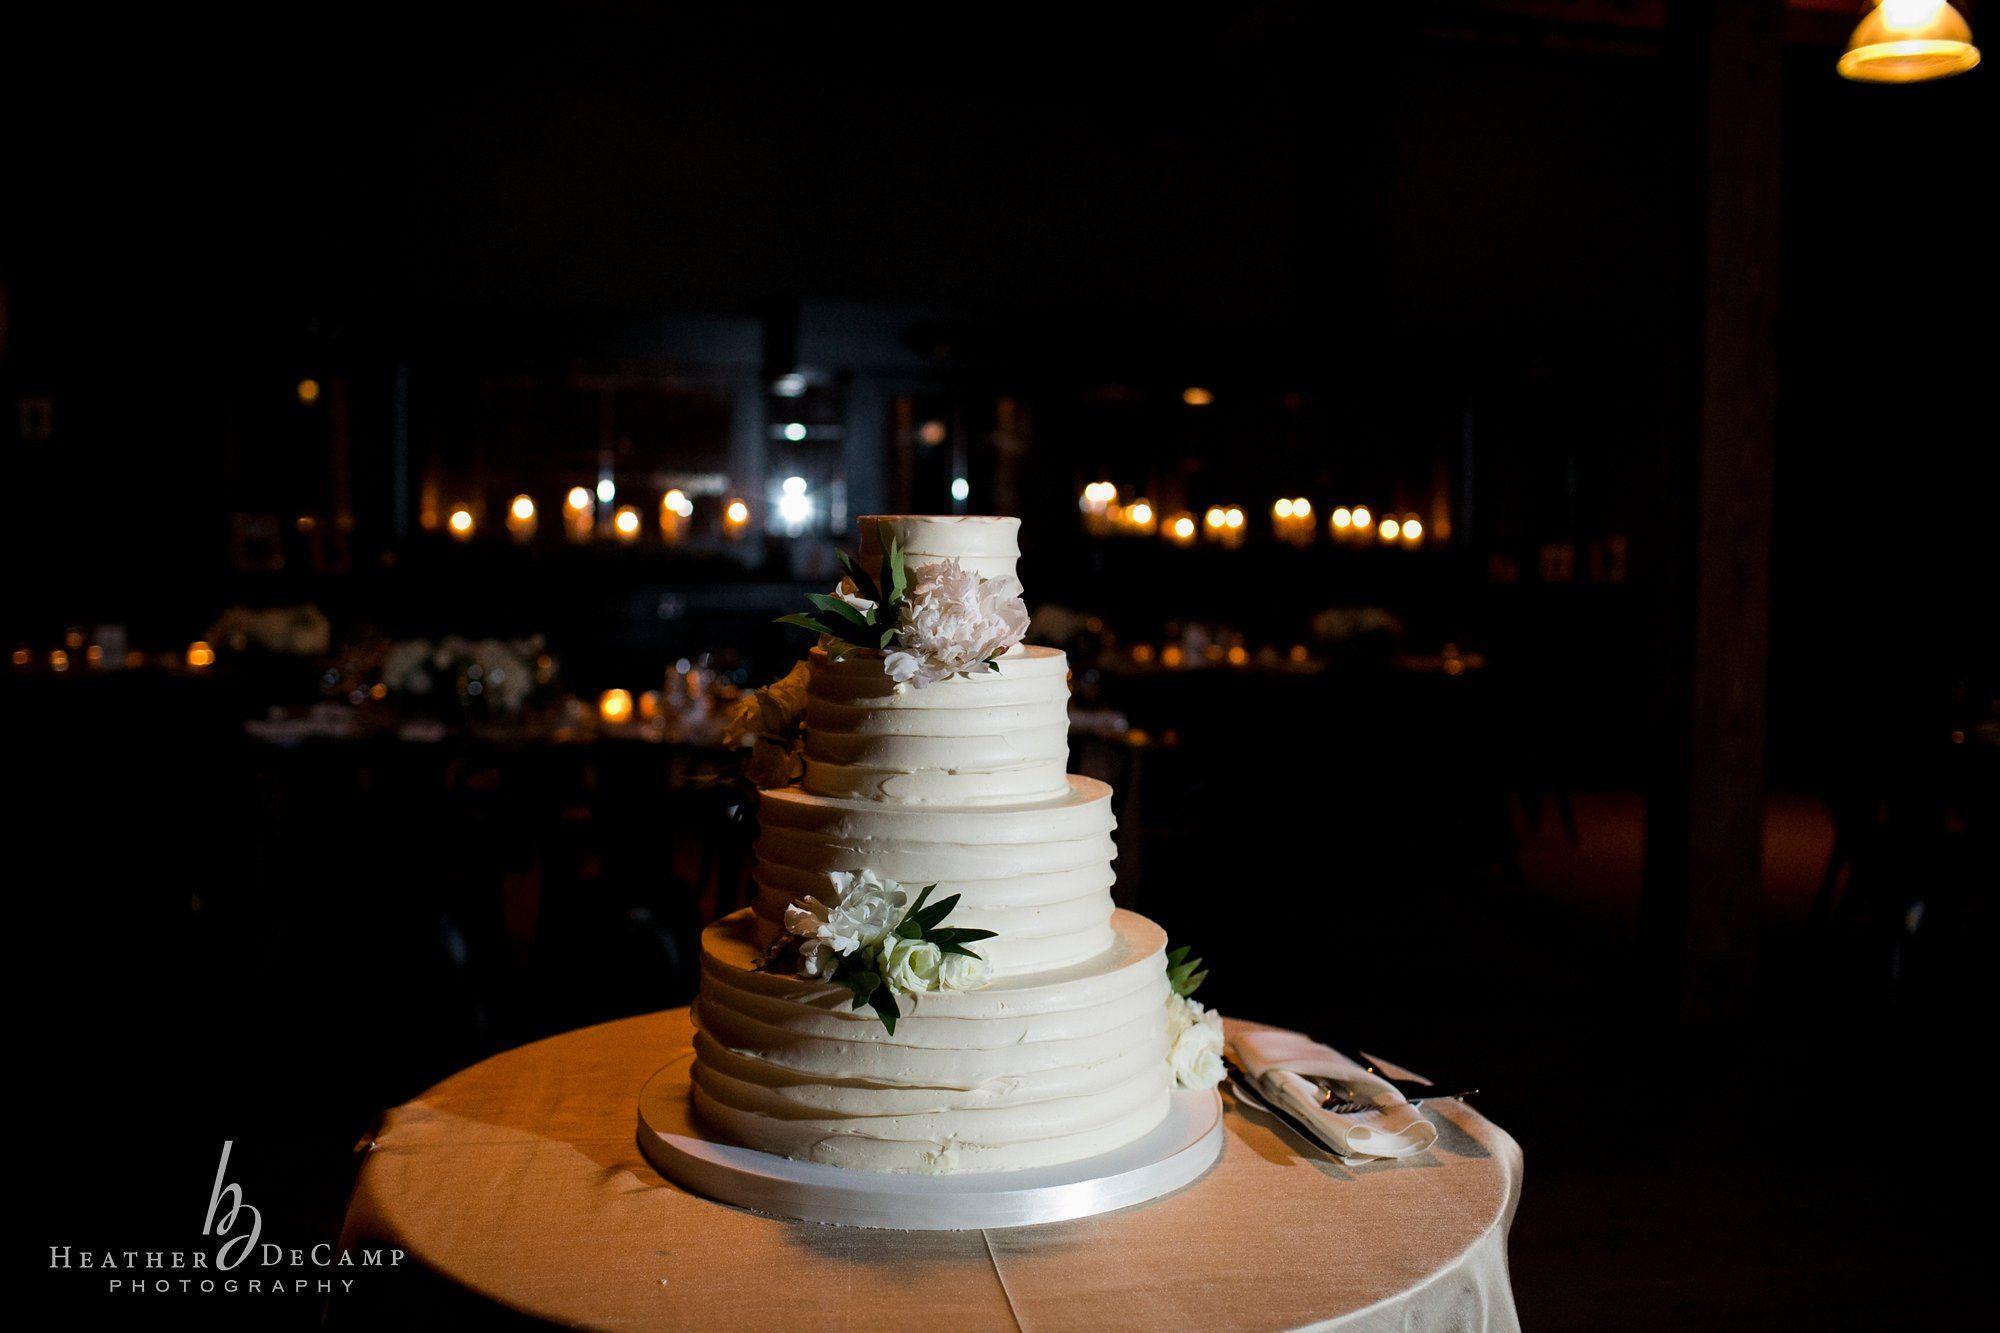 Pin by Artifact Events on John & Alyssa's Wedding 11.5.16